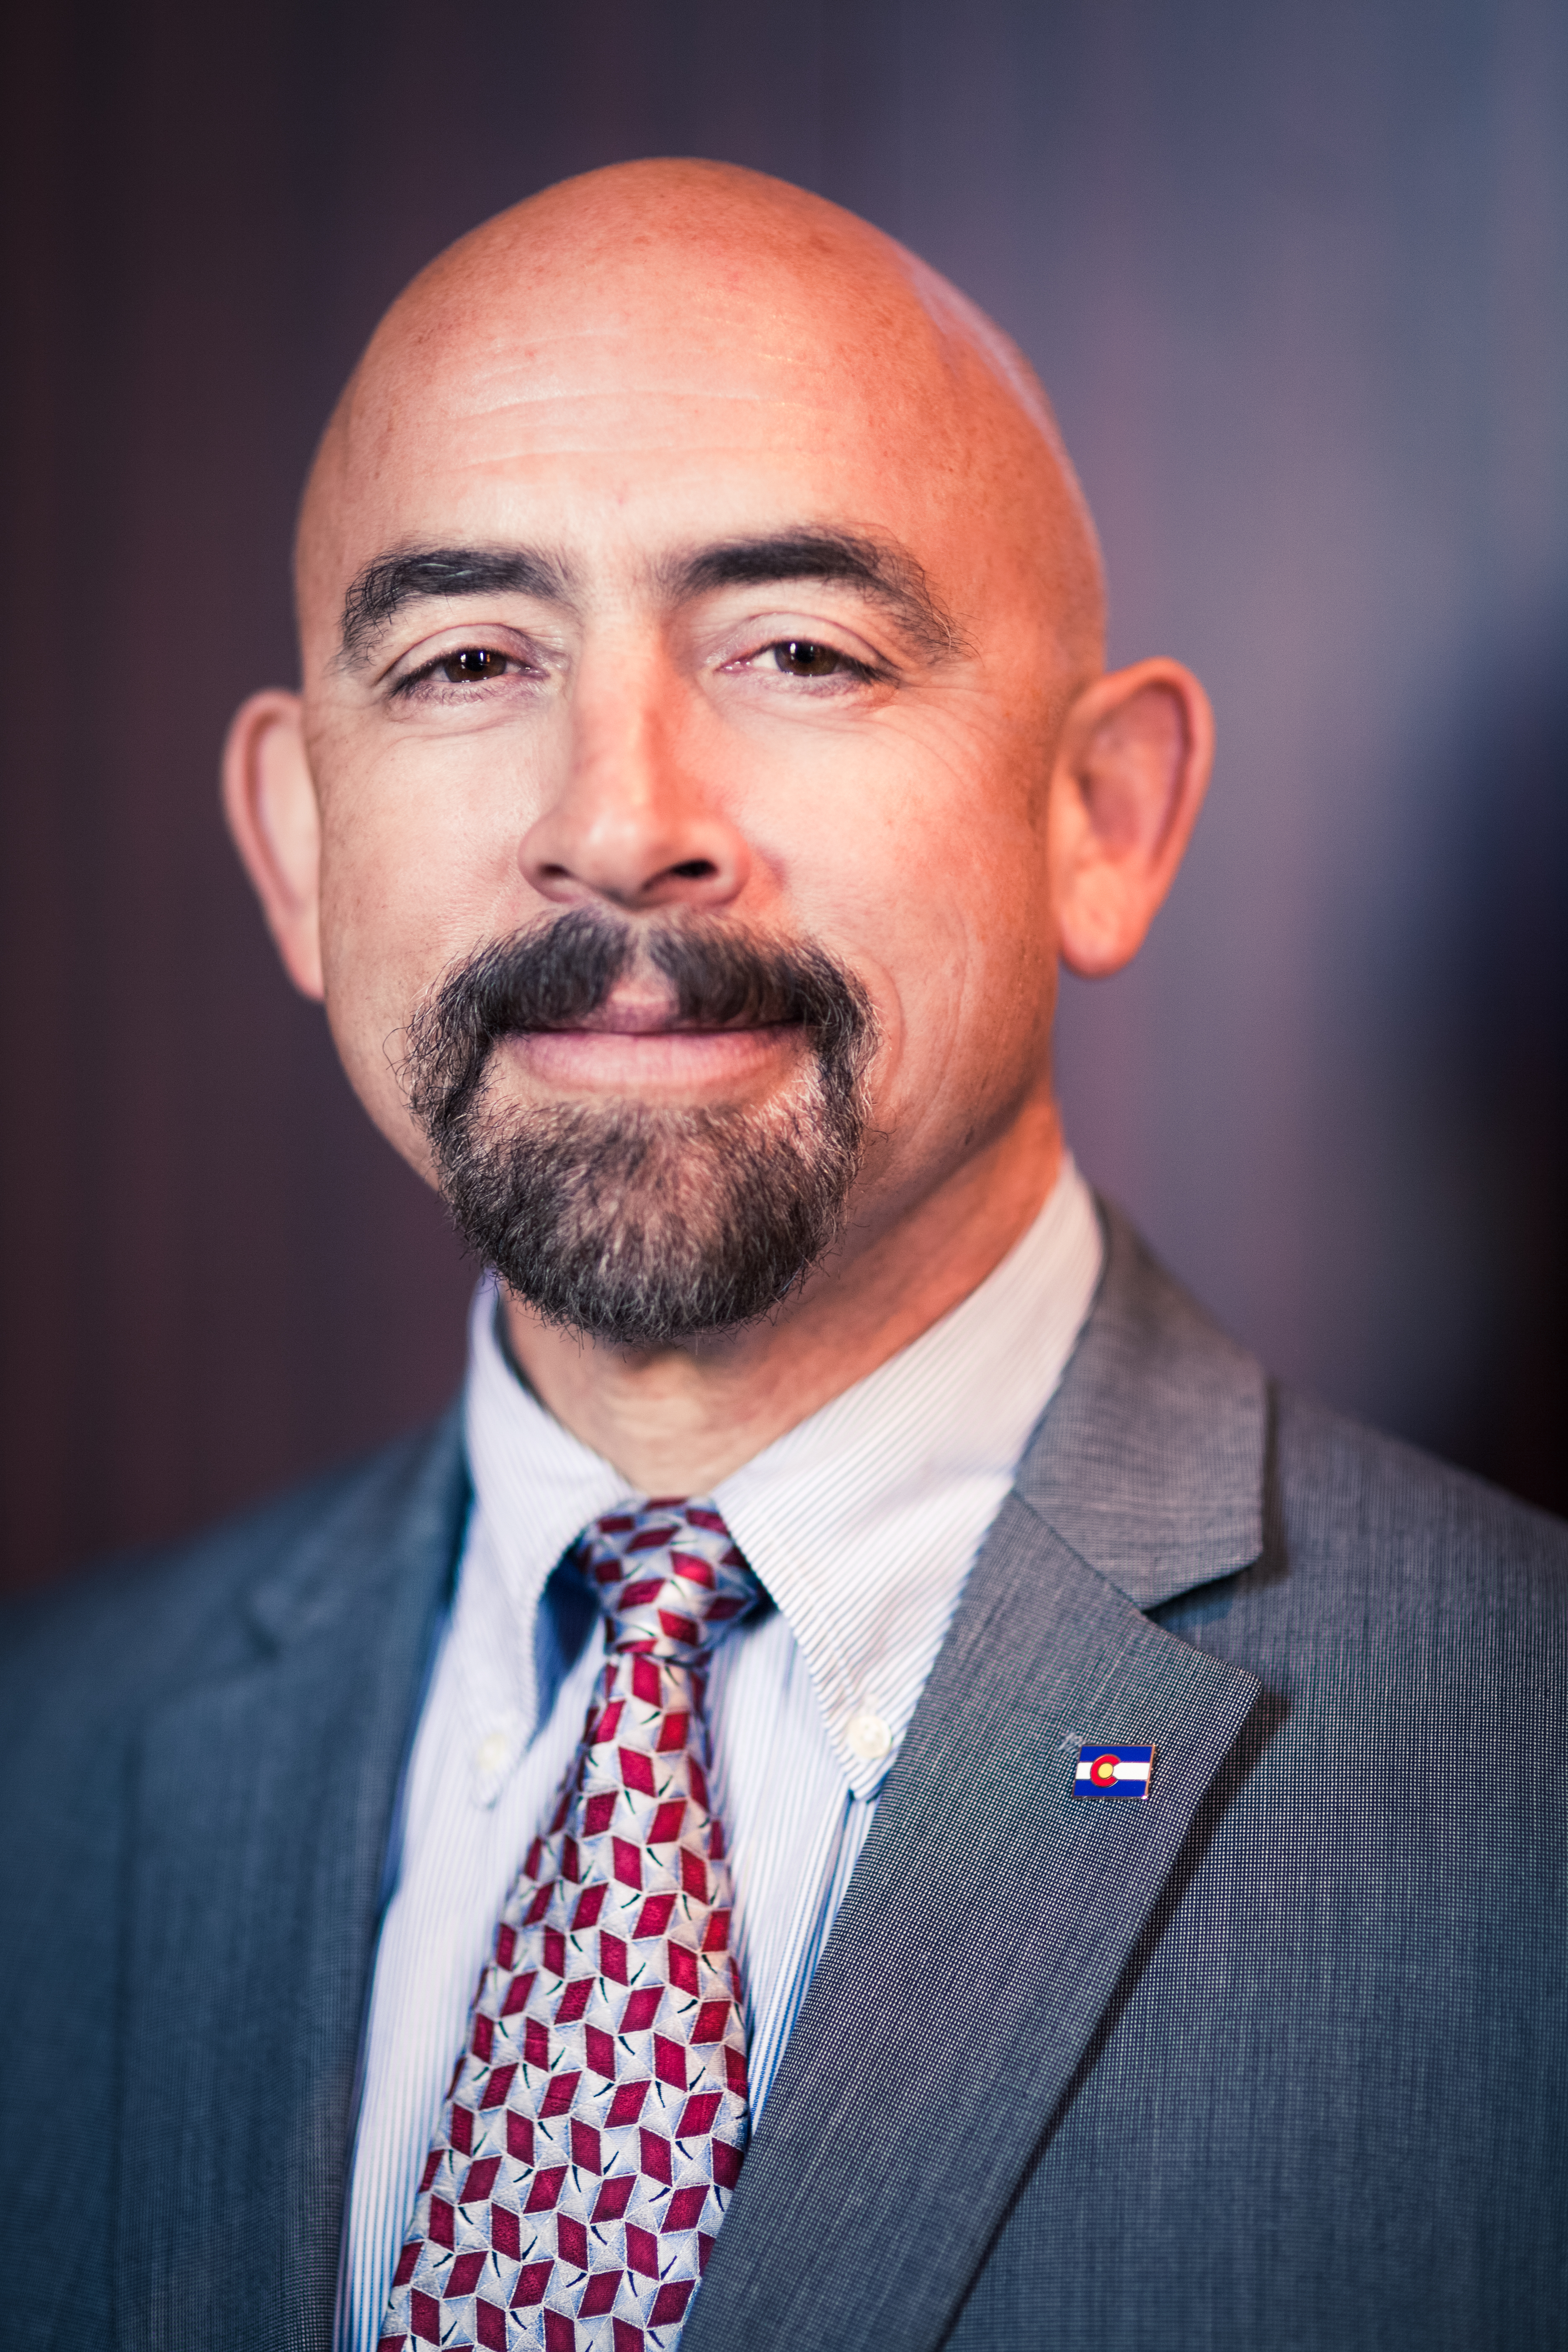 Lt. Governor Joe Garcia